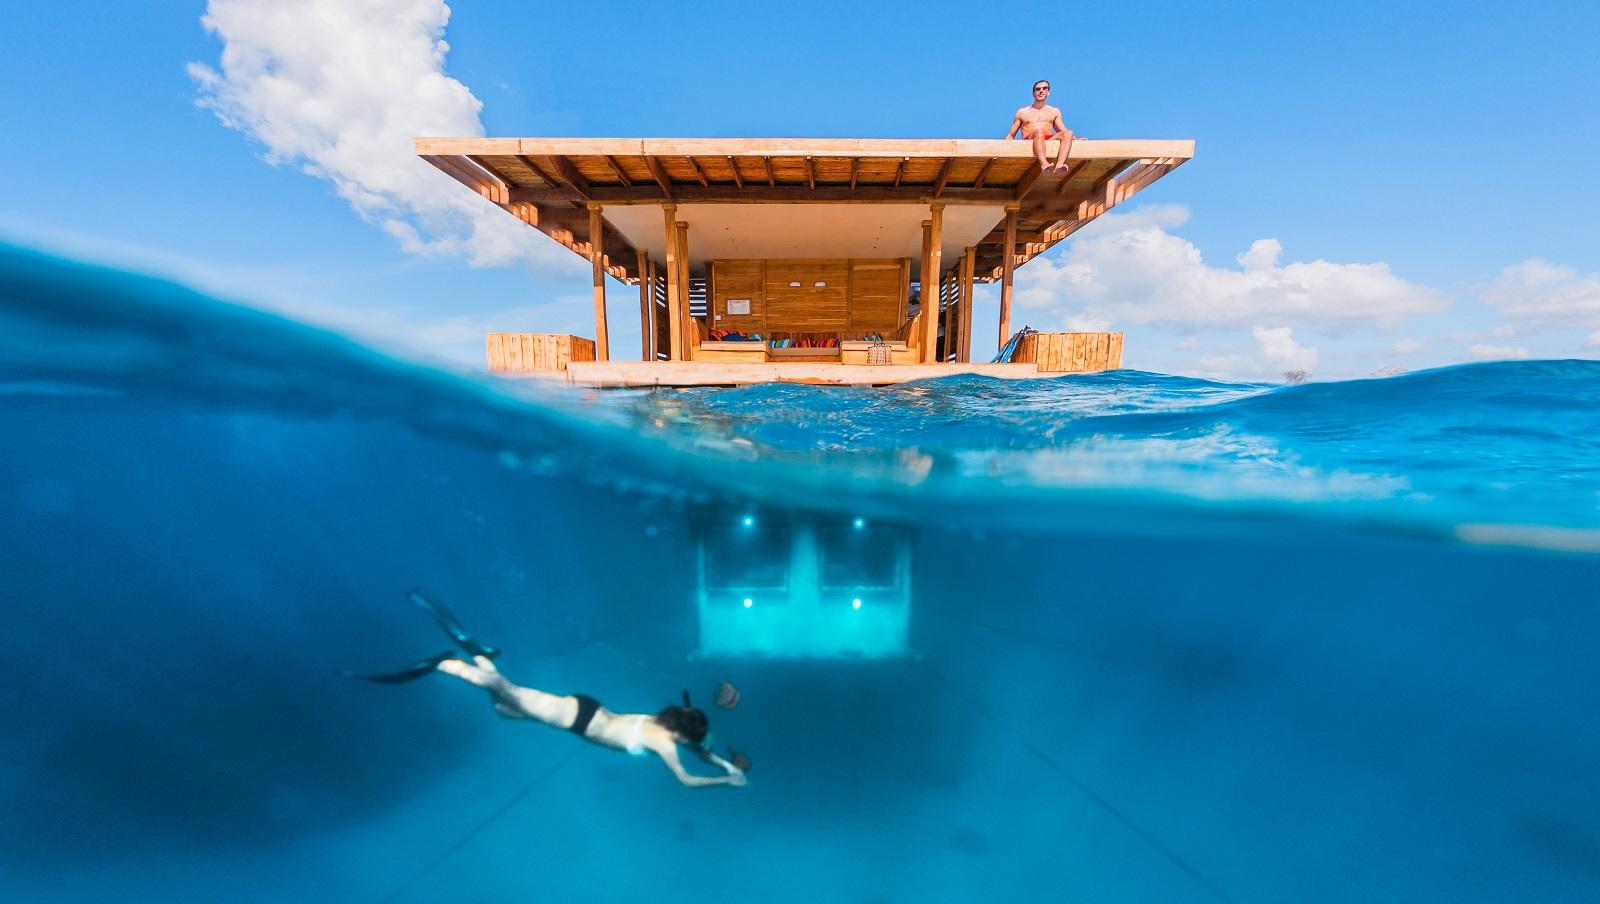 Underwater hotel pemba island tanzania.jpg